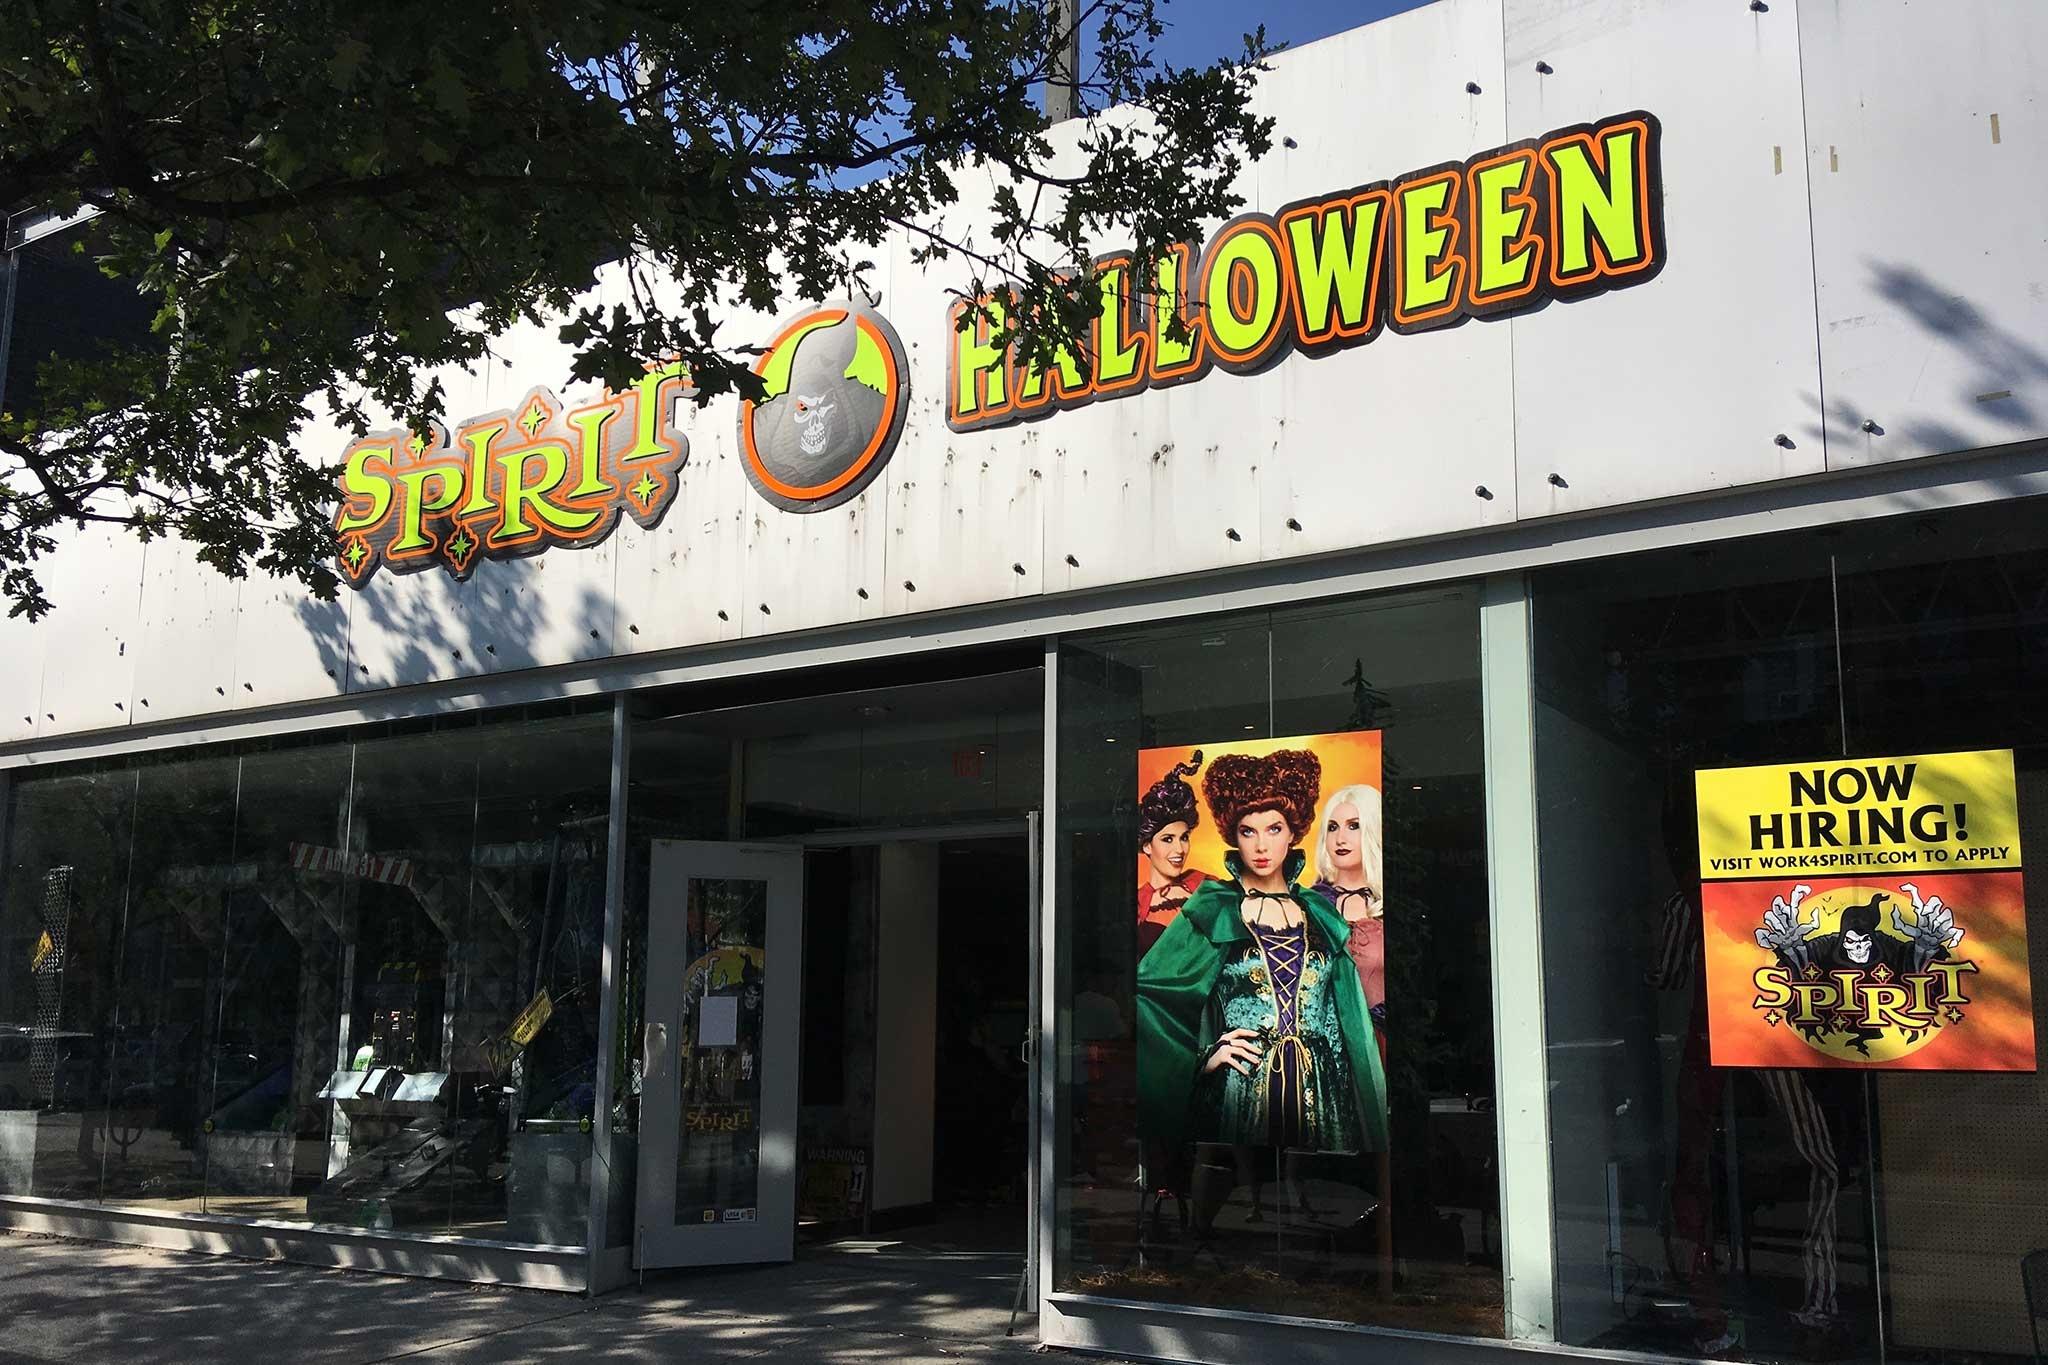 spirit halloween - closed - blogto - toronto